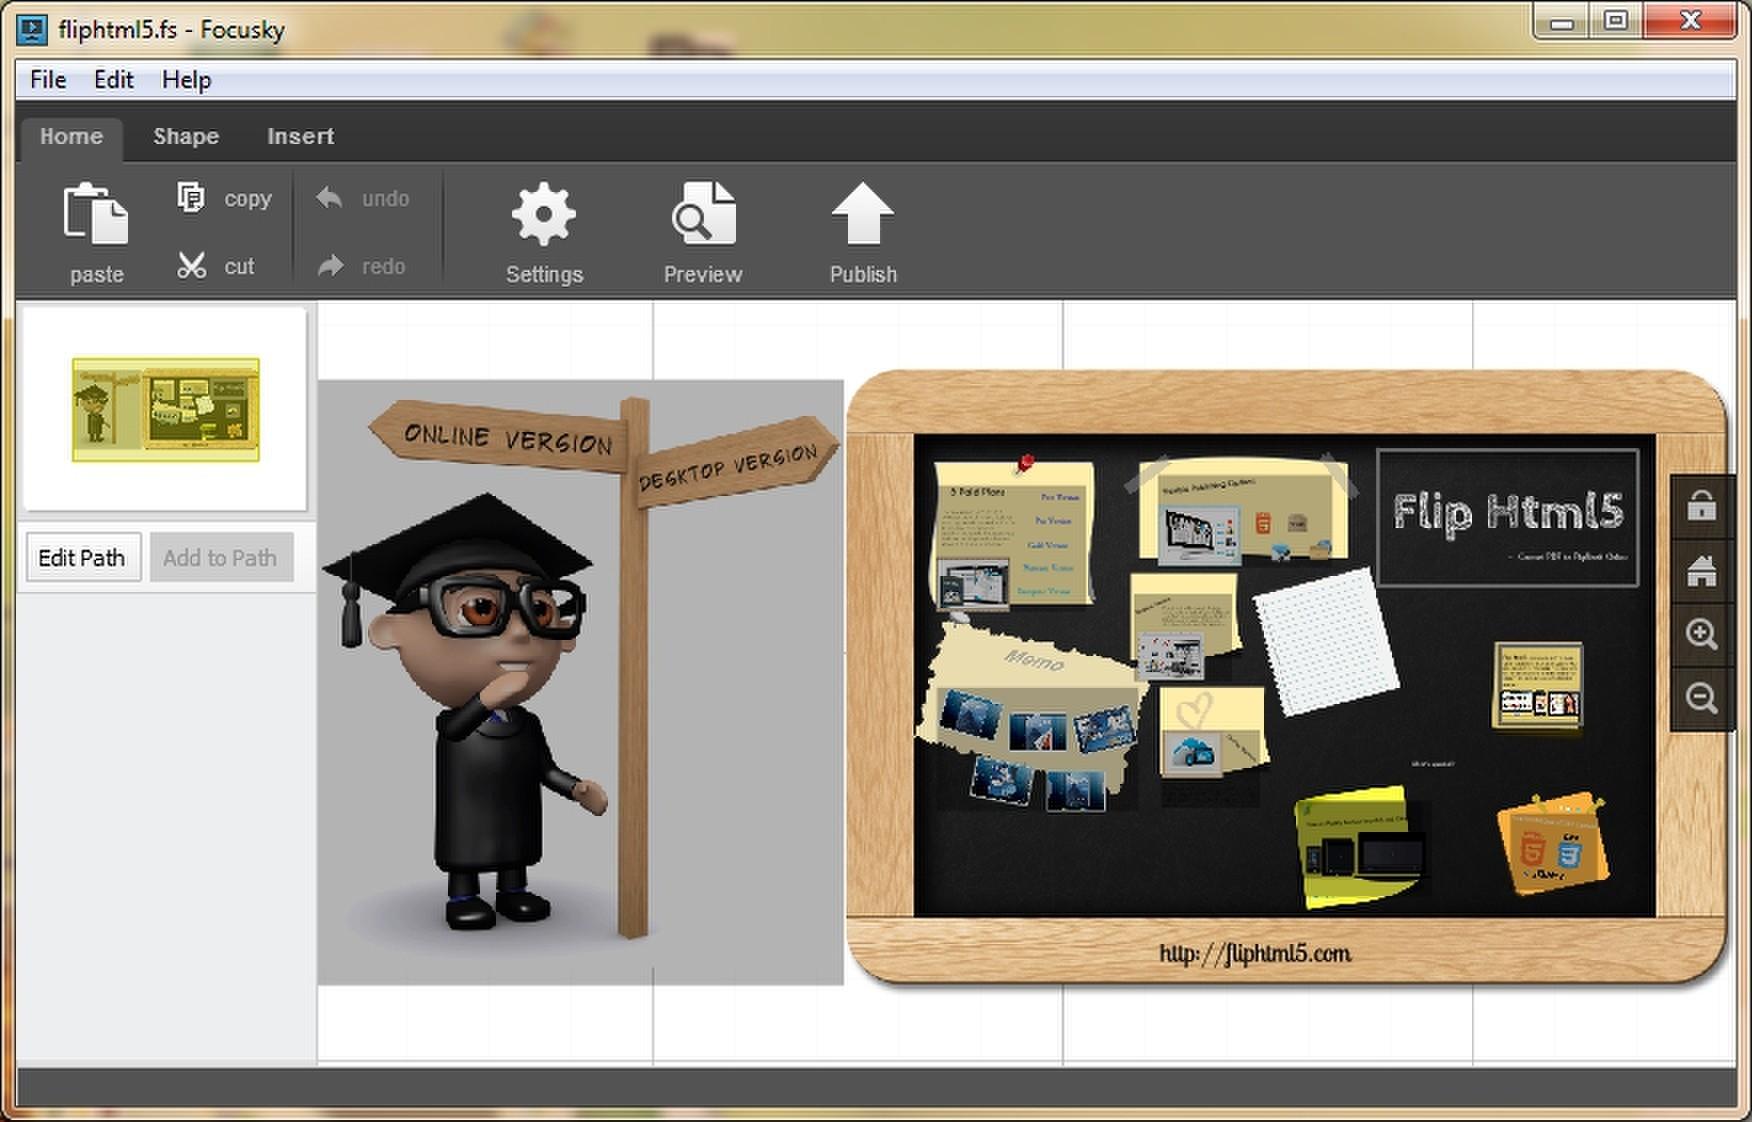 focusky com released creative presentation maker for educators